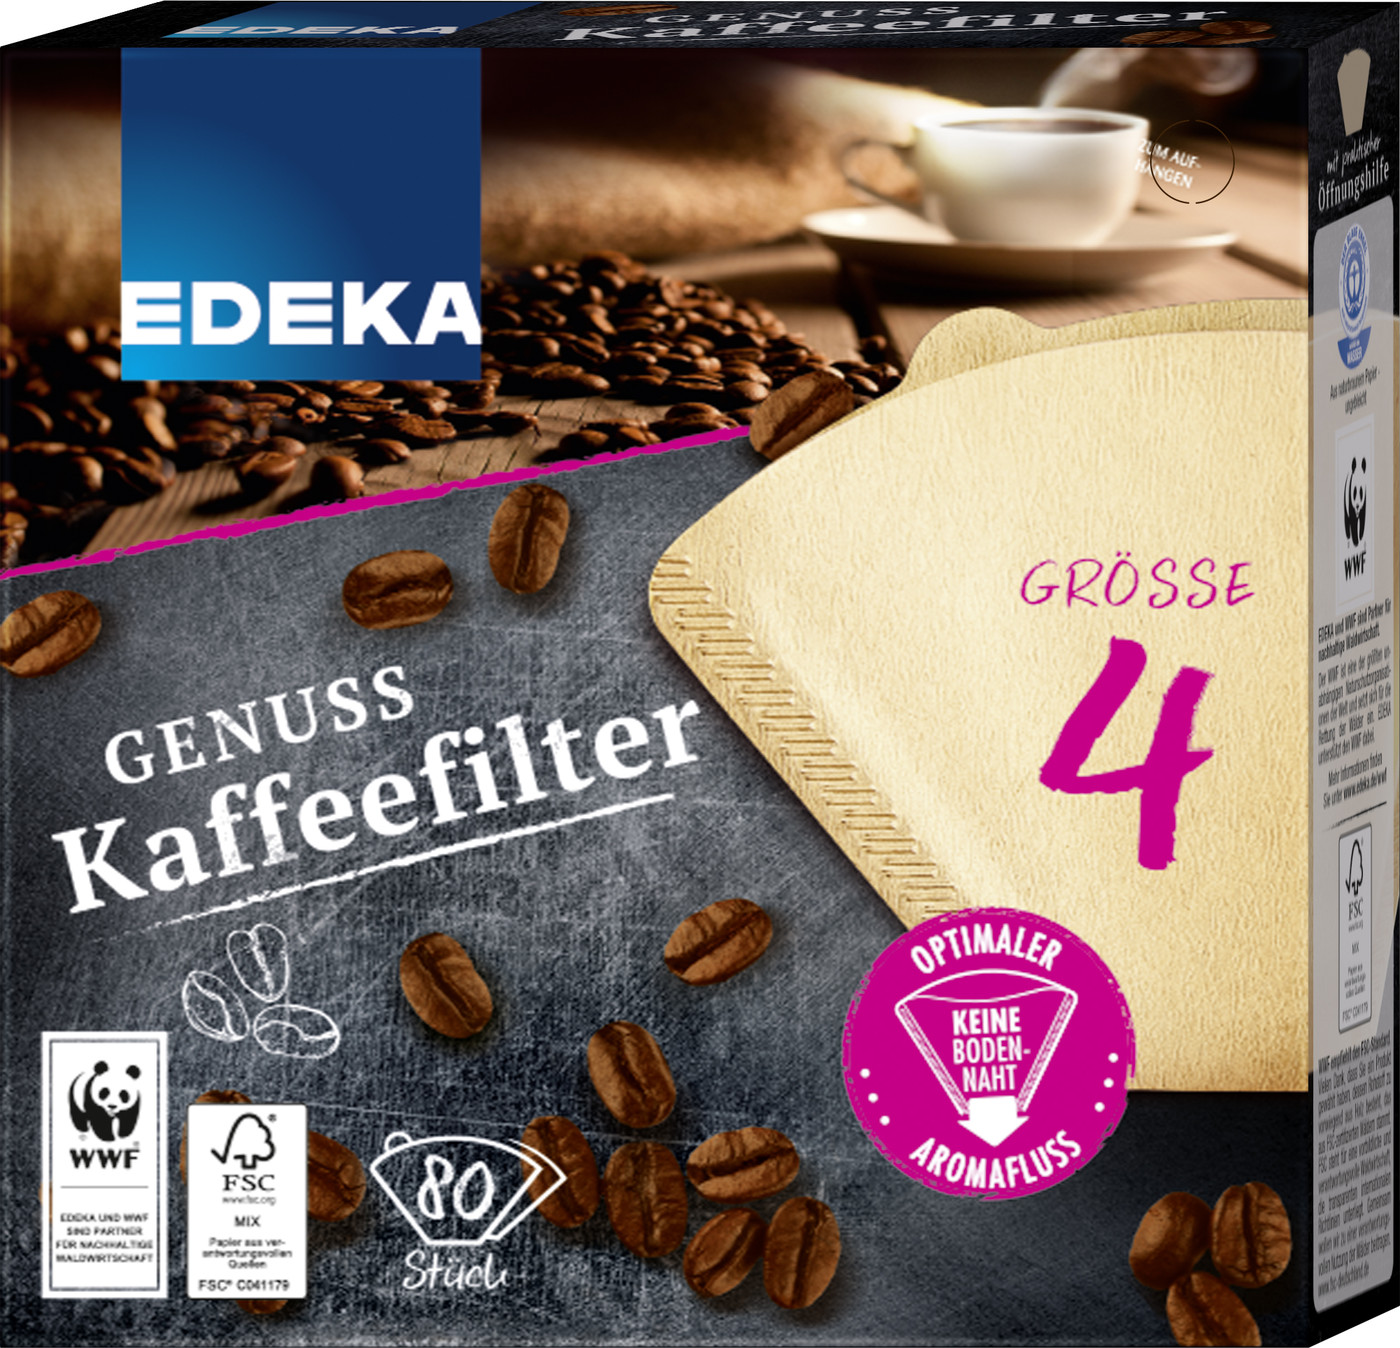 edeka24 edeka unsere besten kaffeefilter gr e 4 online kaufen. Black Bedroom Furniture Sets. Home Design Ideas